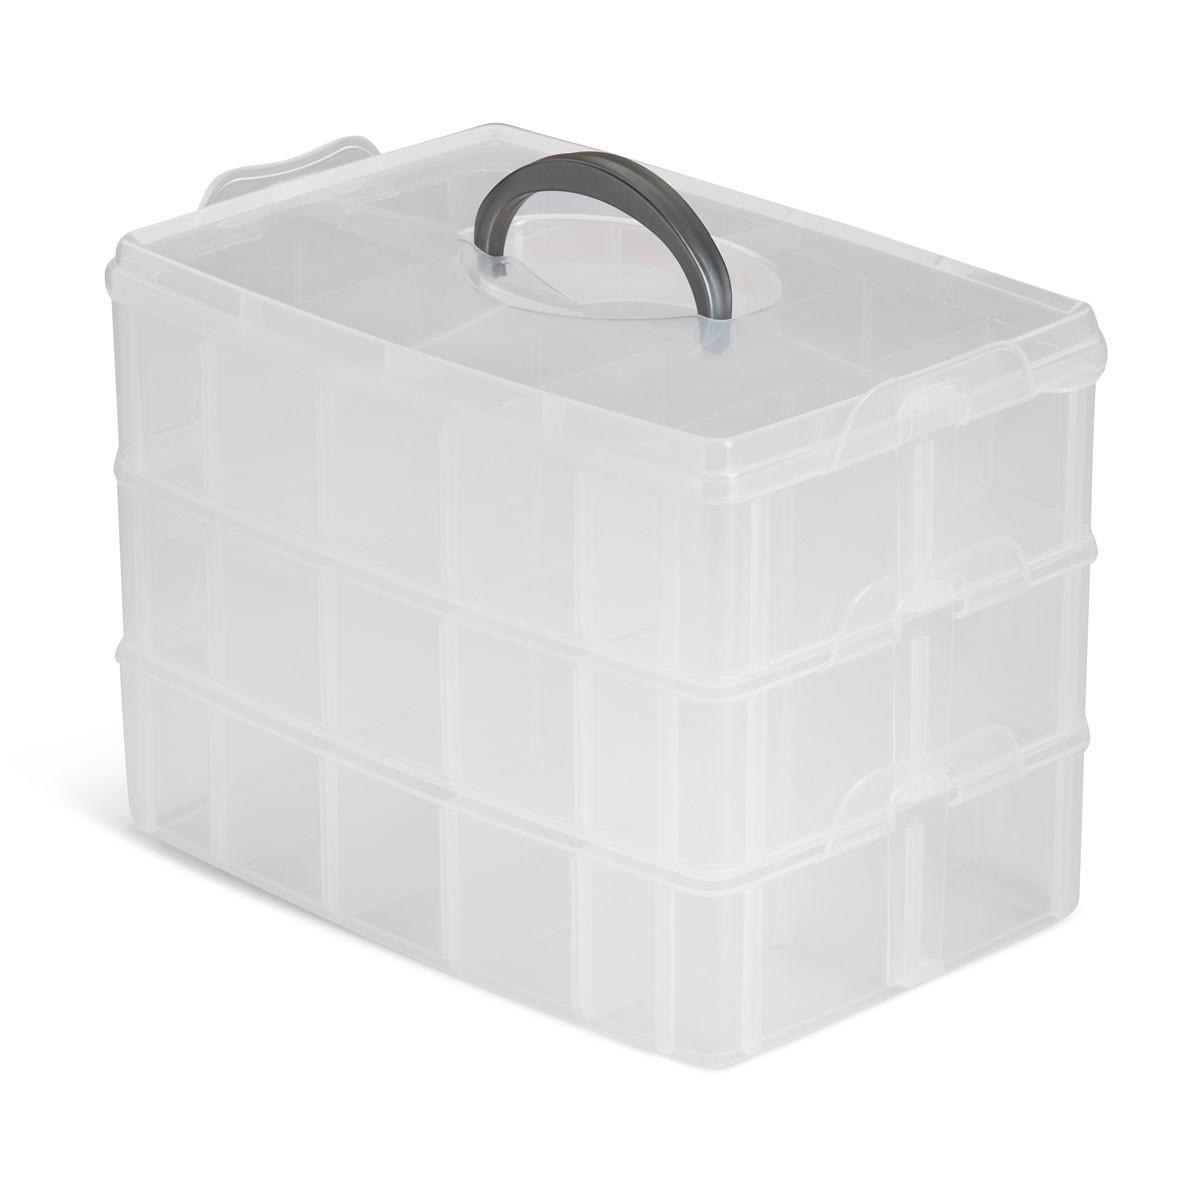 Plastic Carrying Case Organizer